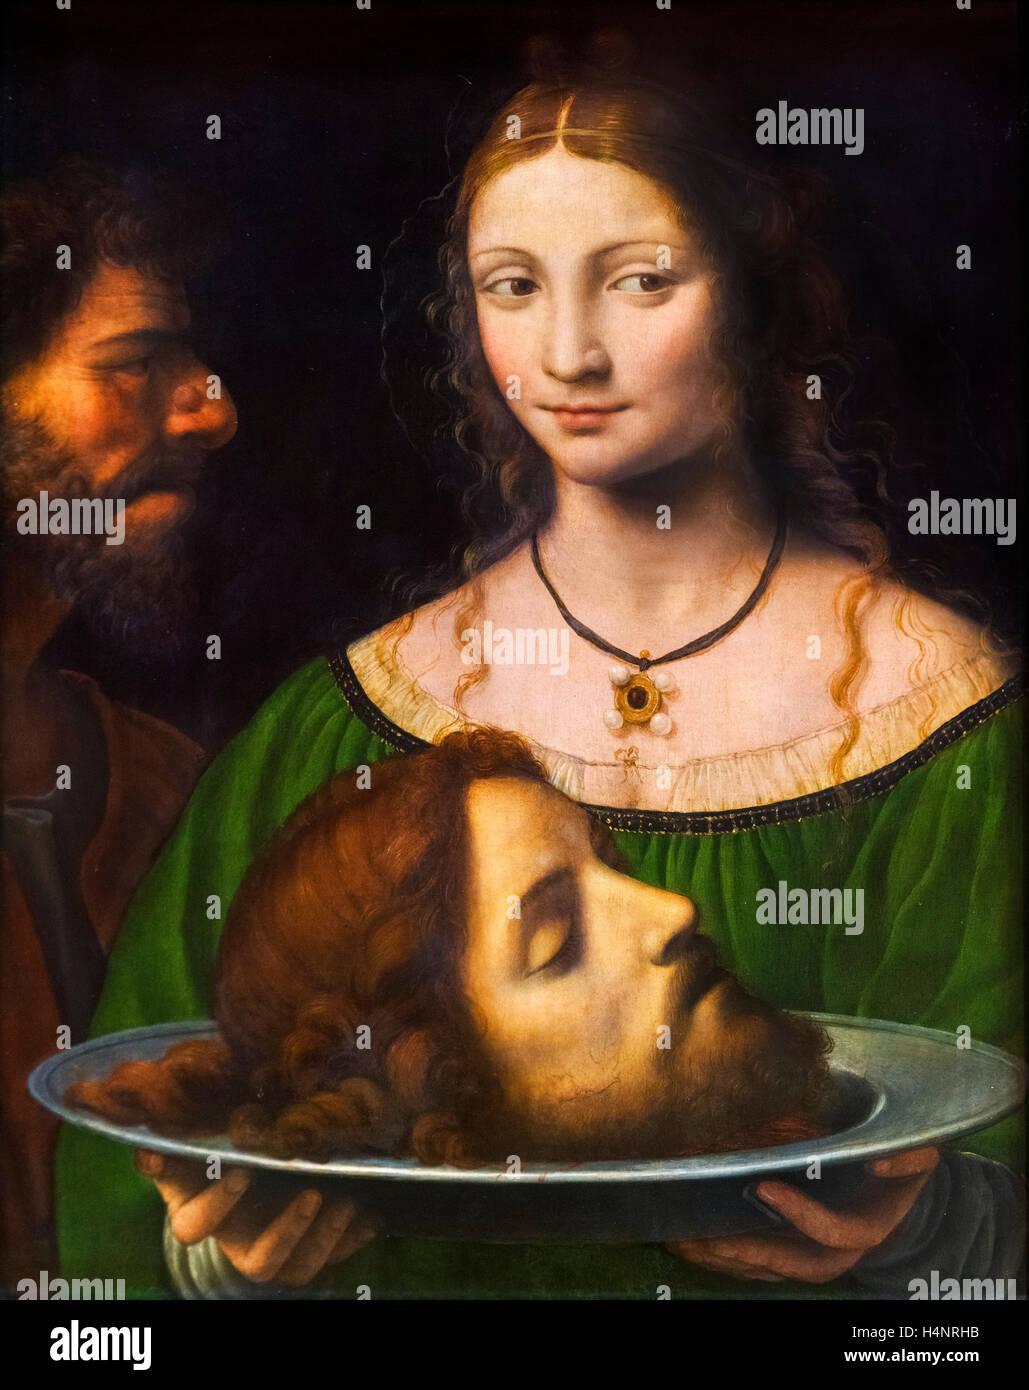 Salome with the Head of John the Baptist by Bernardo Luini (c.1480-1532), c.1525-1530 - Stock Image